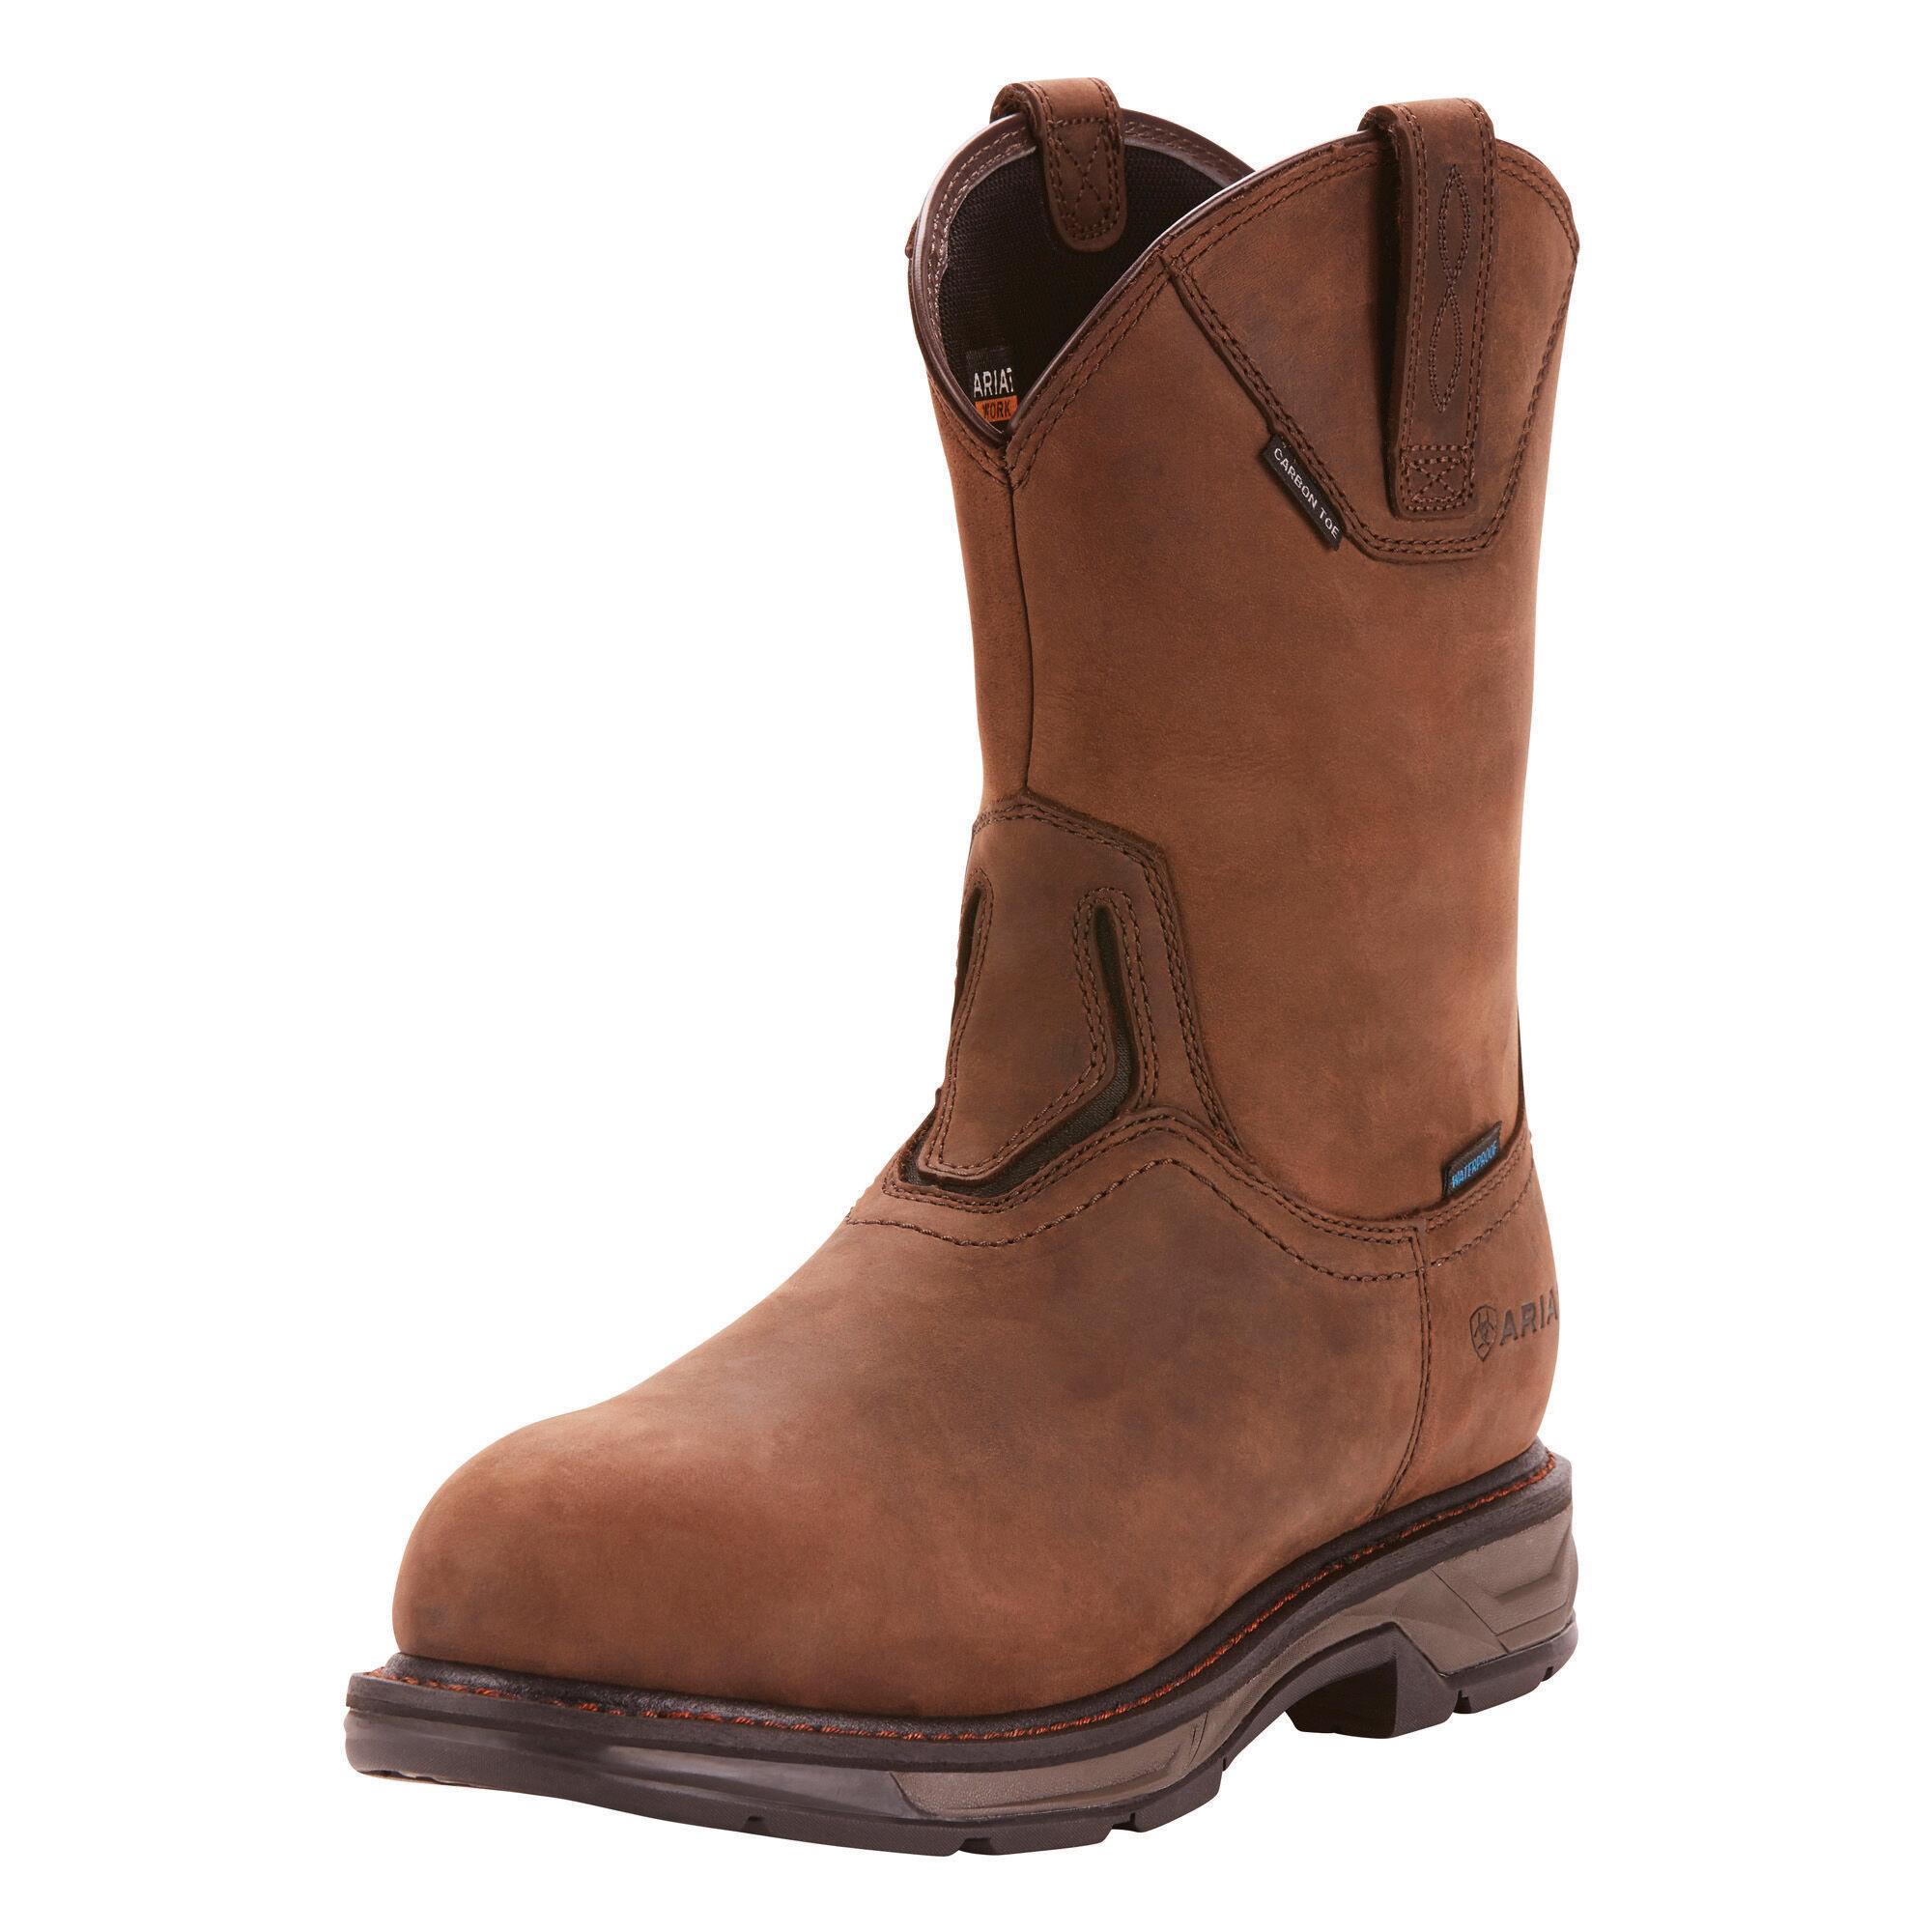 WorkHog XT Wellington Waterproof Carbon Toe Work Boot